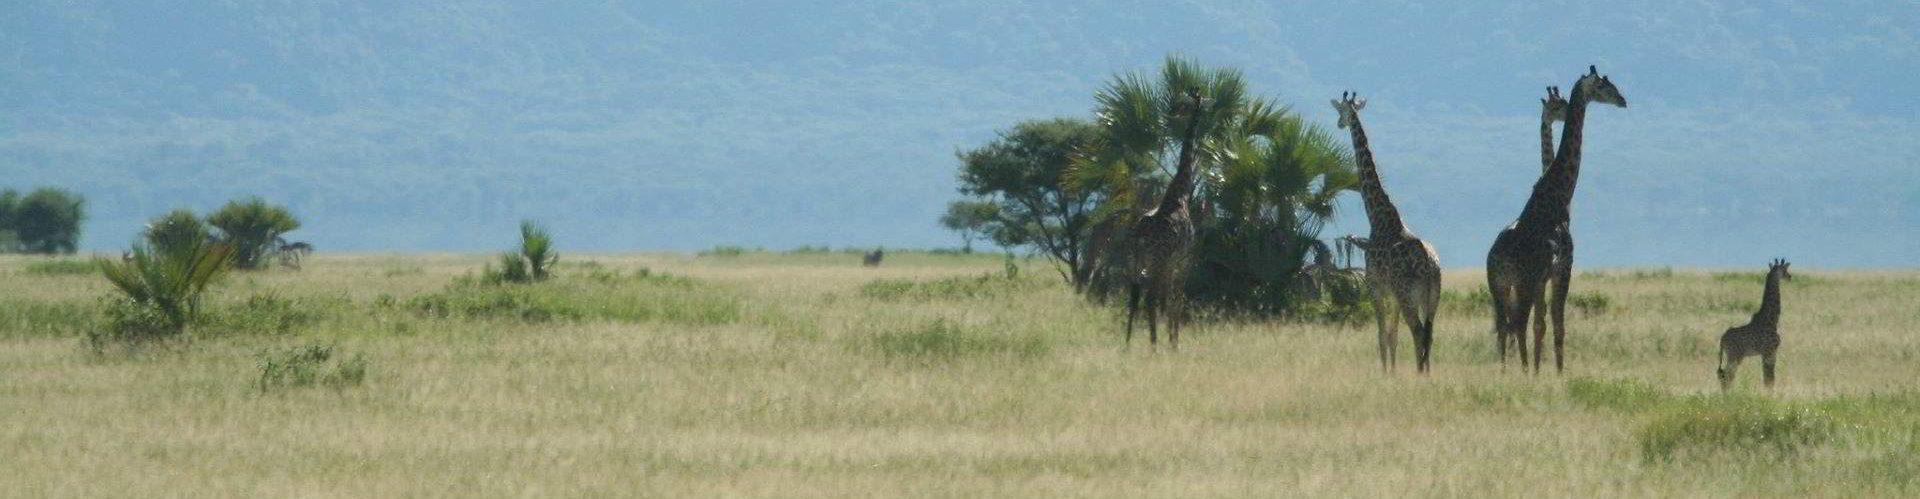 Maramboi-Camp-Tanzania